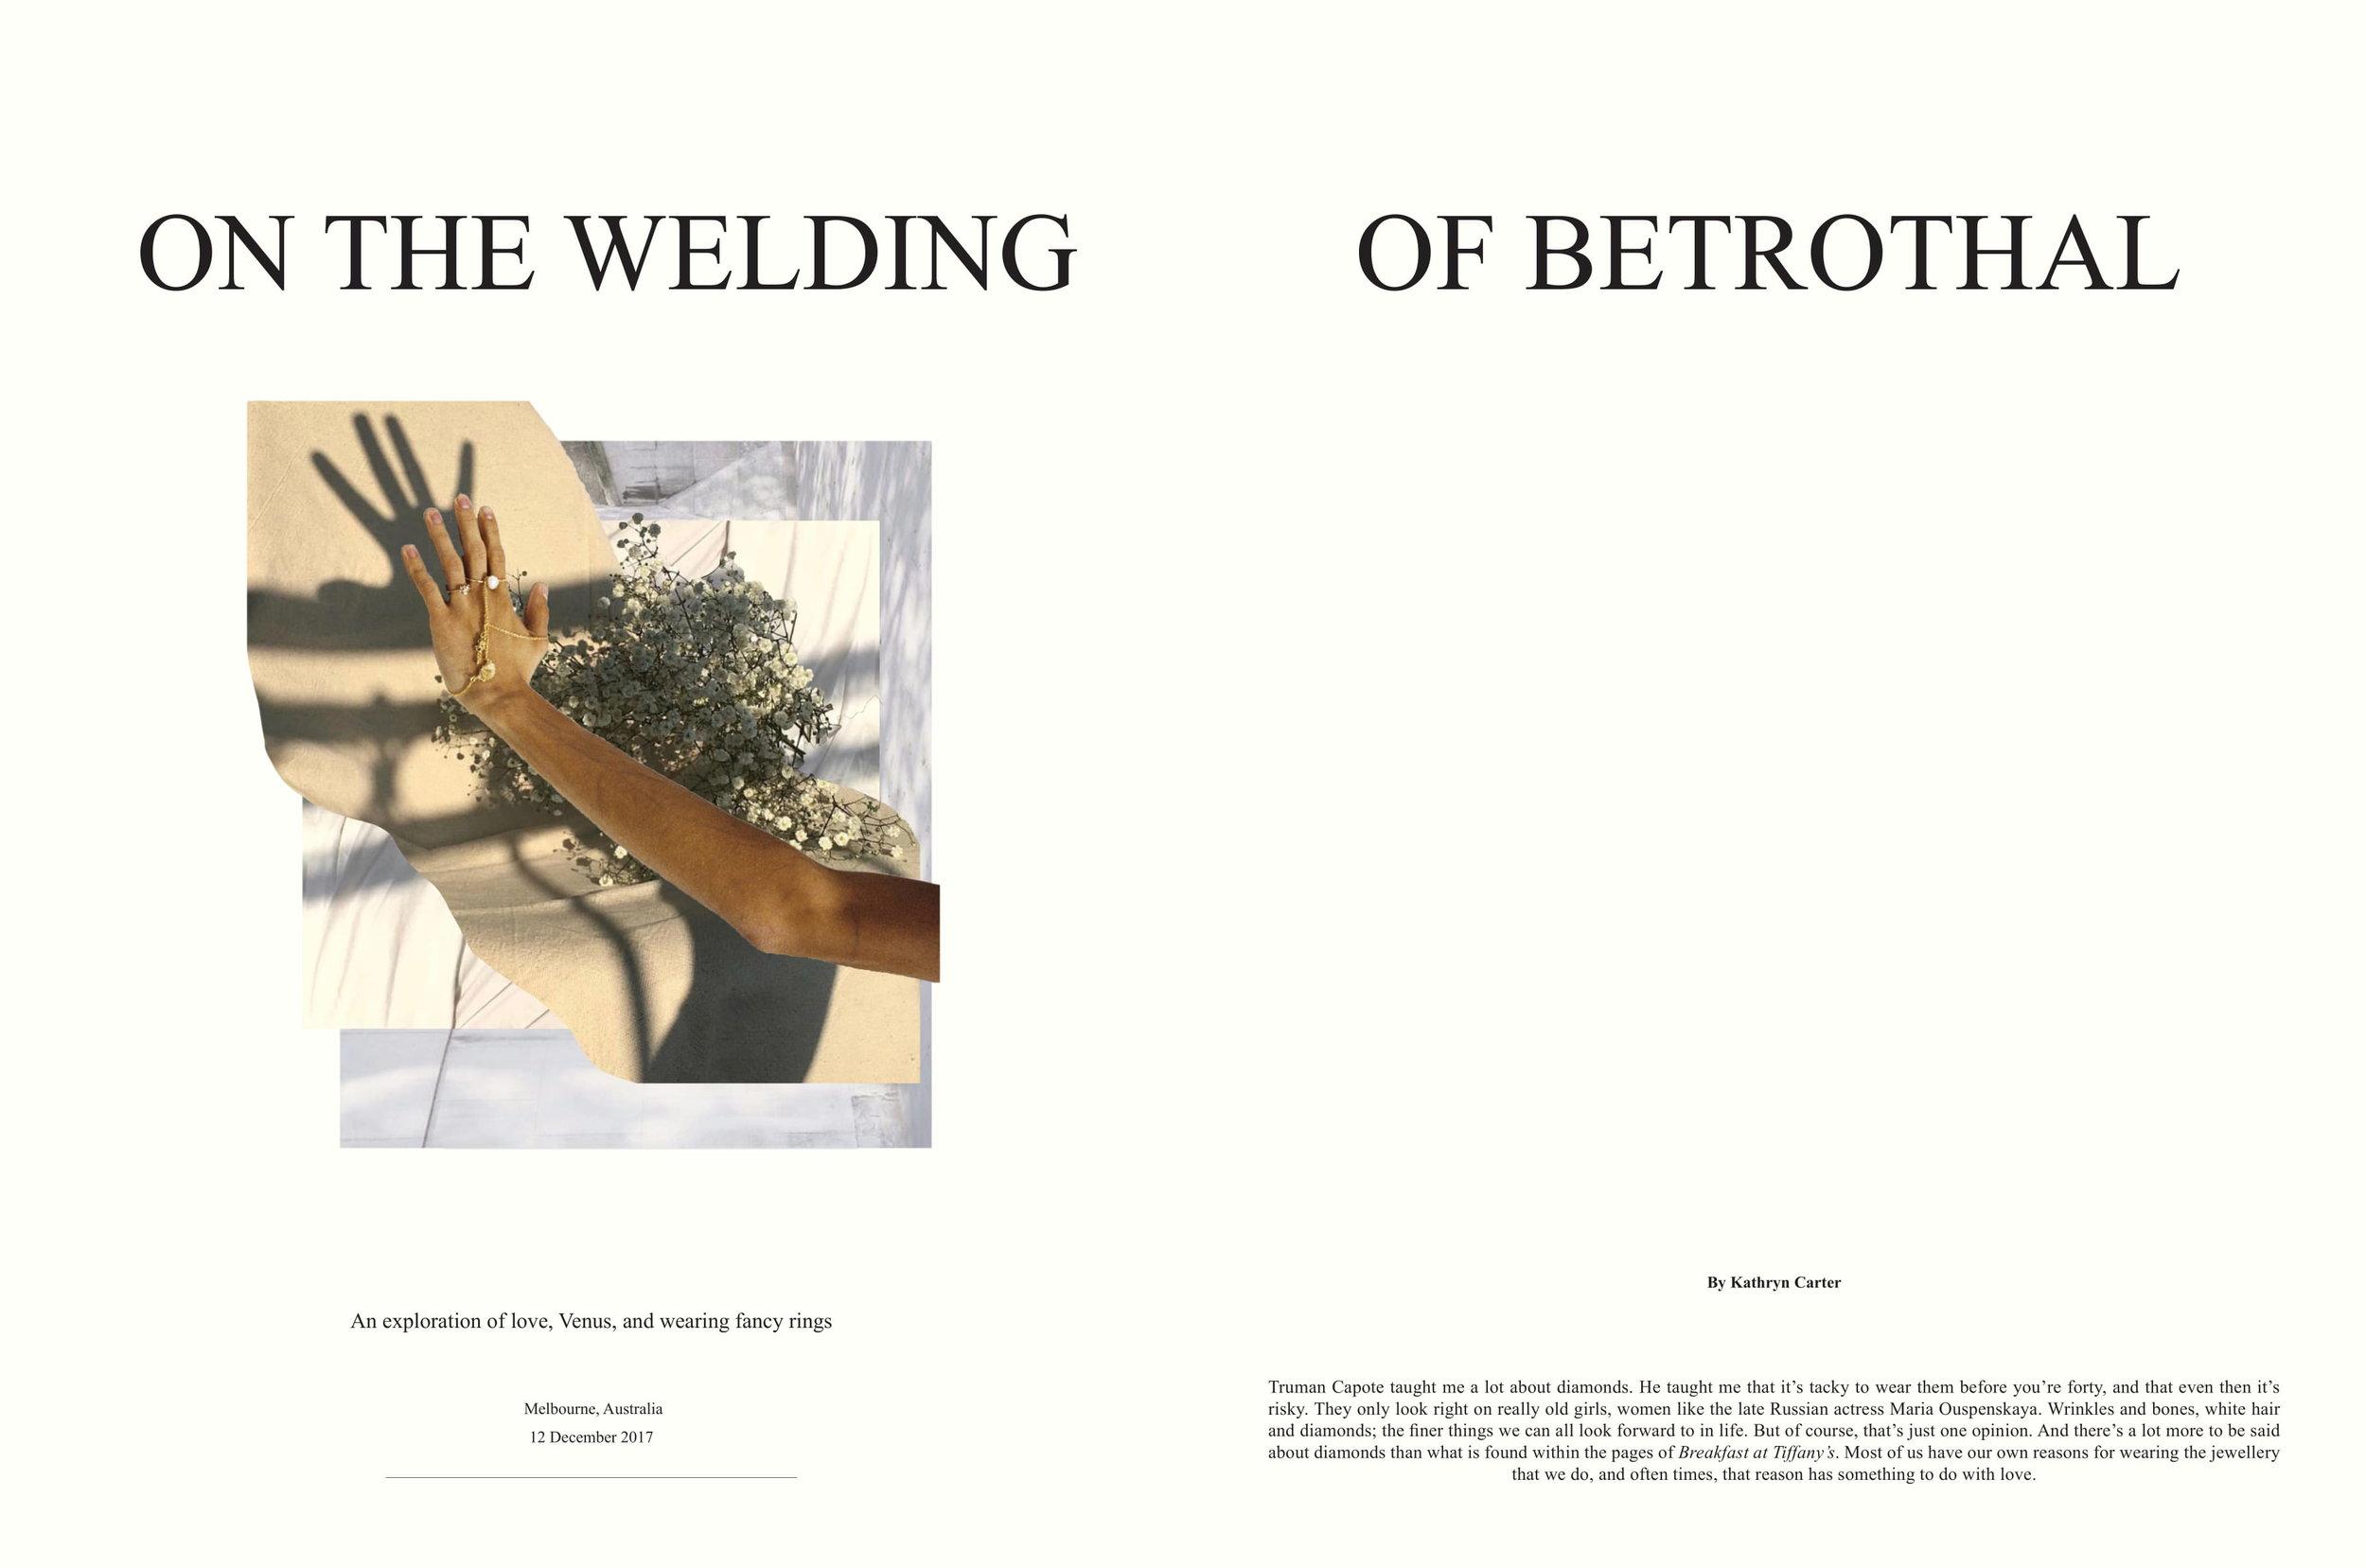 On the welding of betrothal-1.jpg